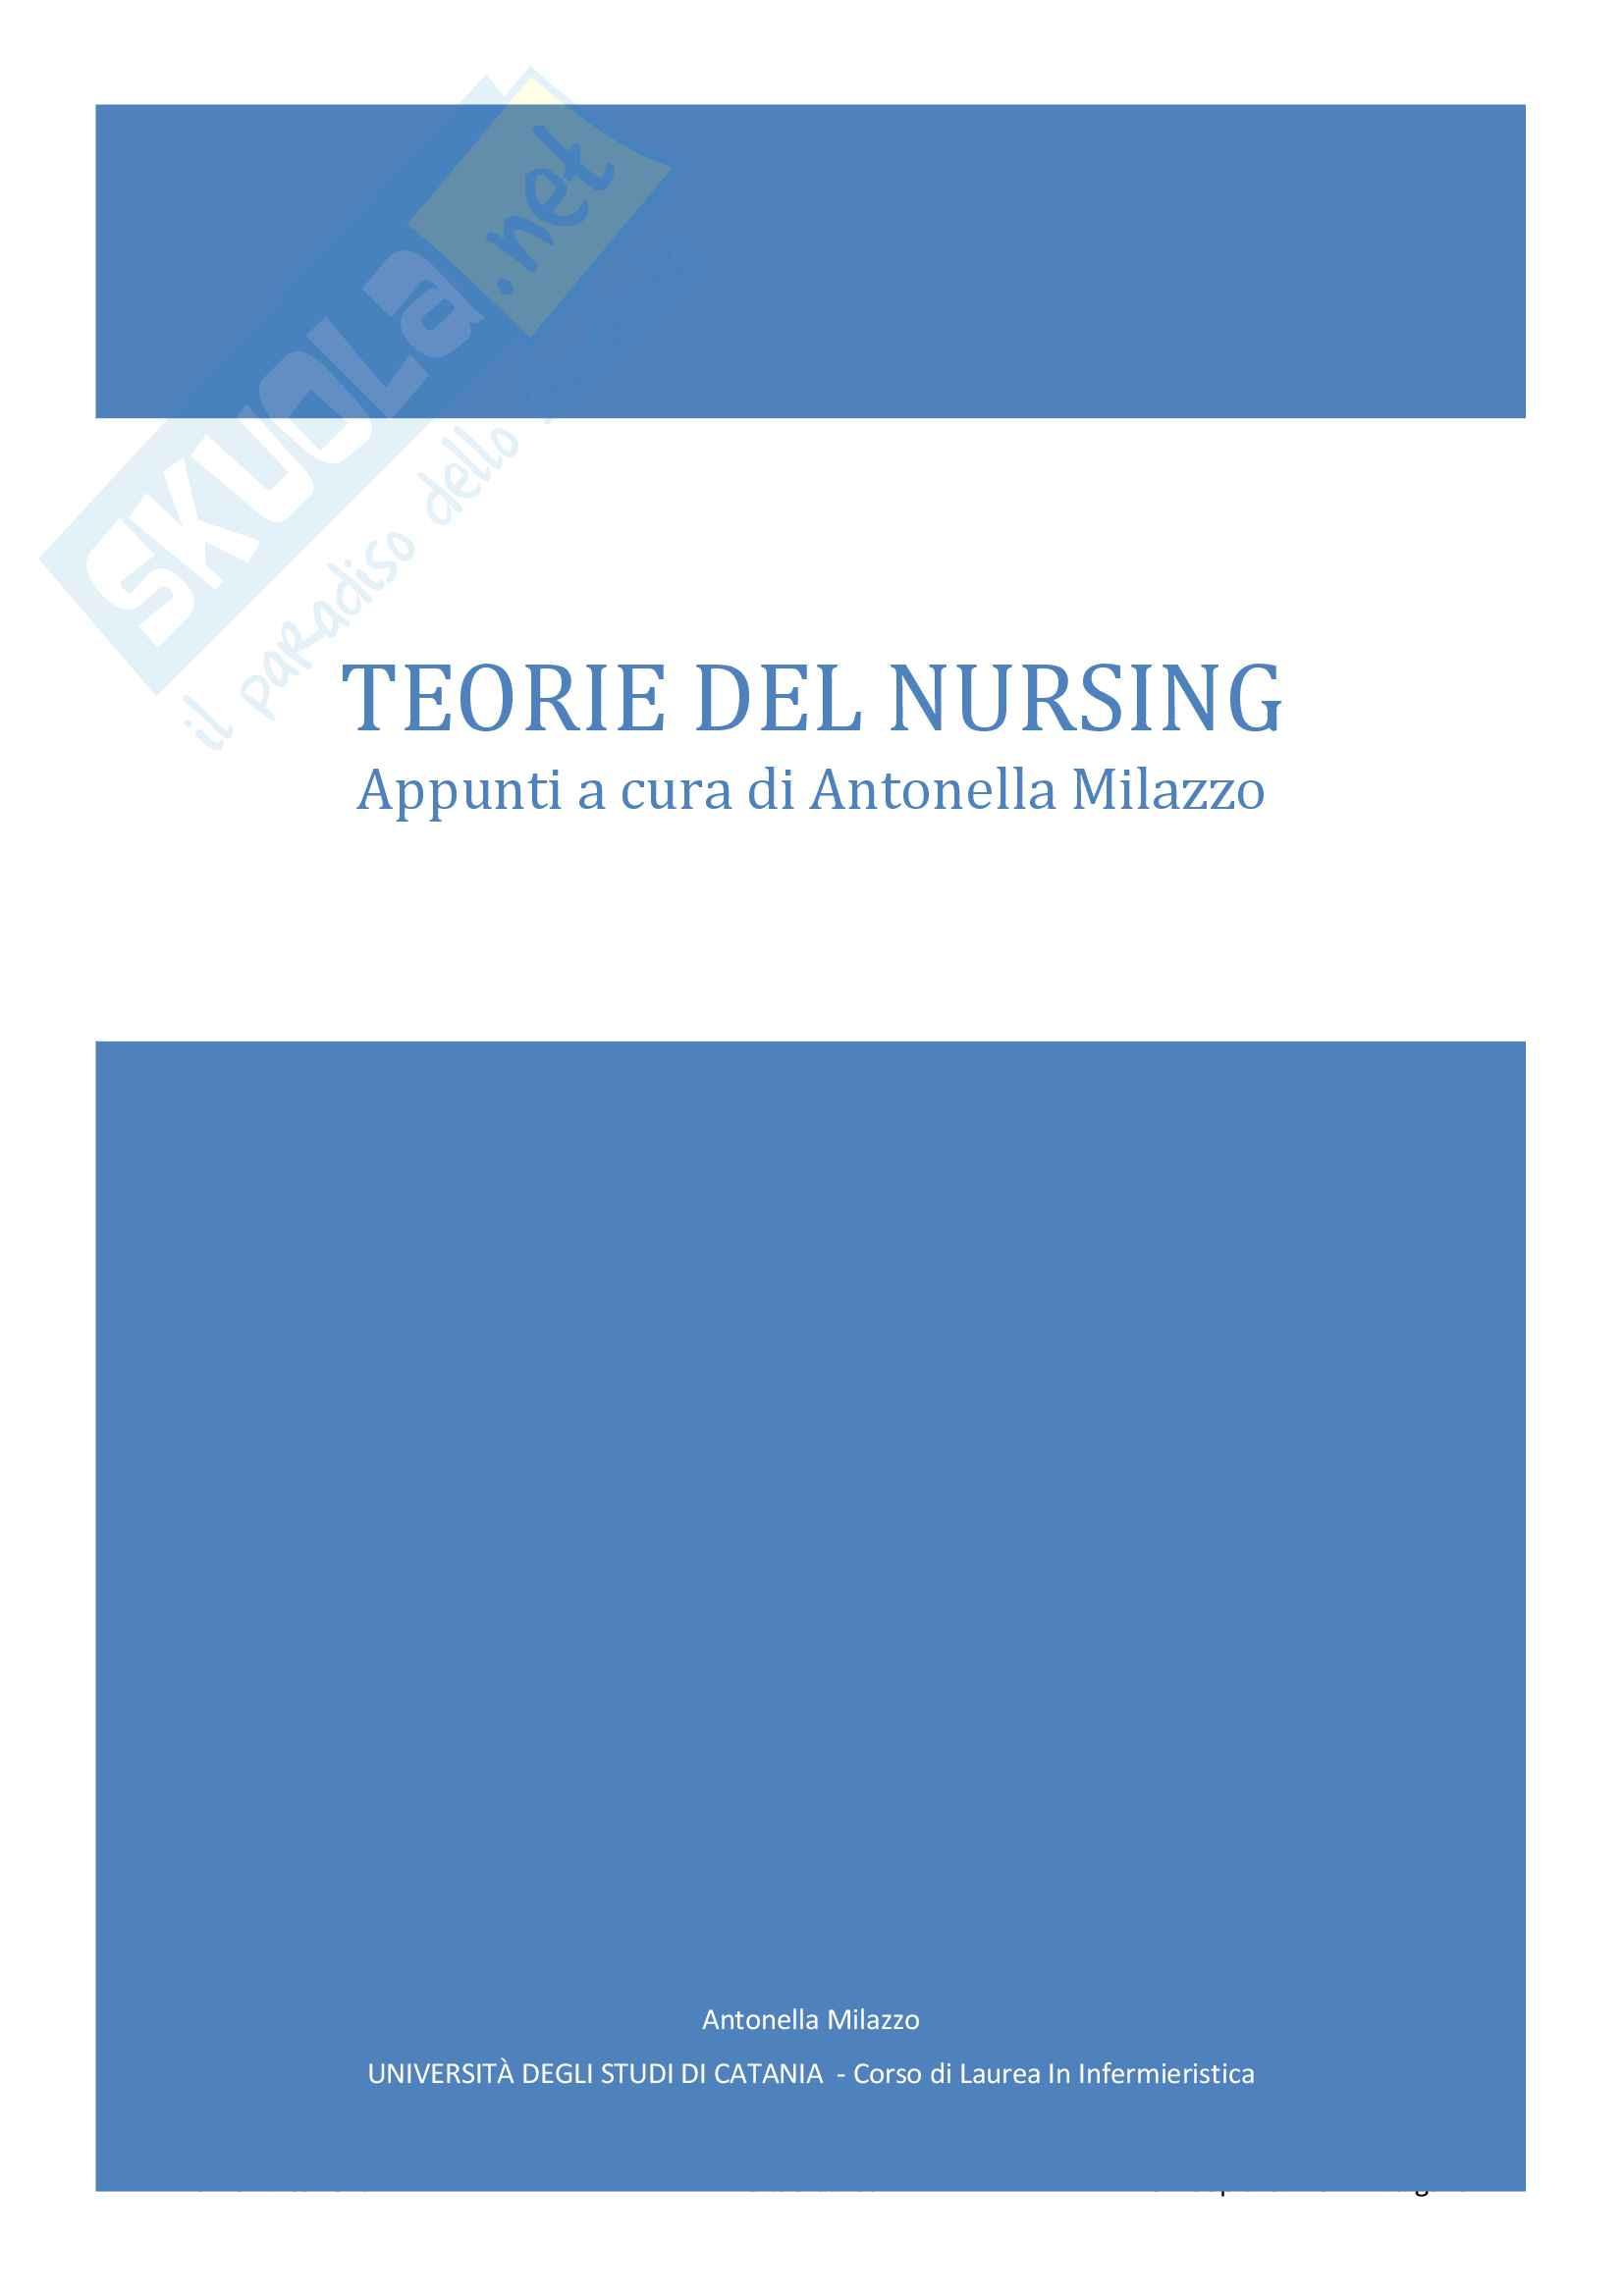 Teorie del Nursing